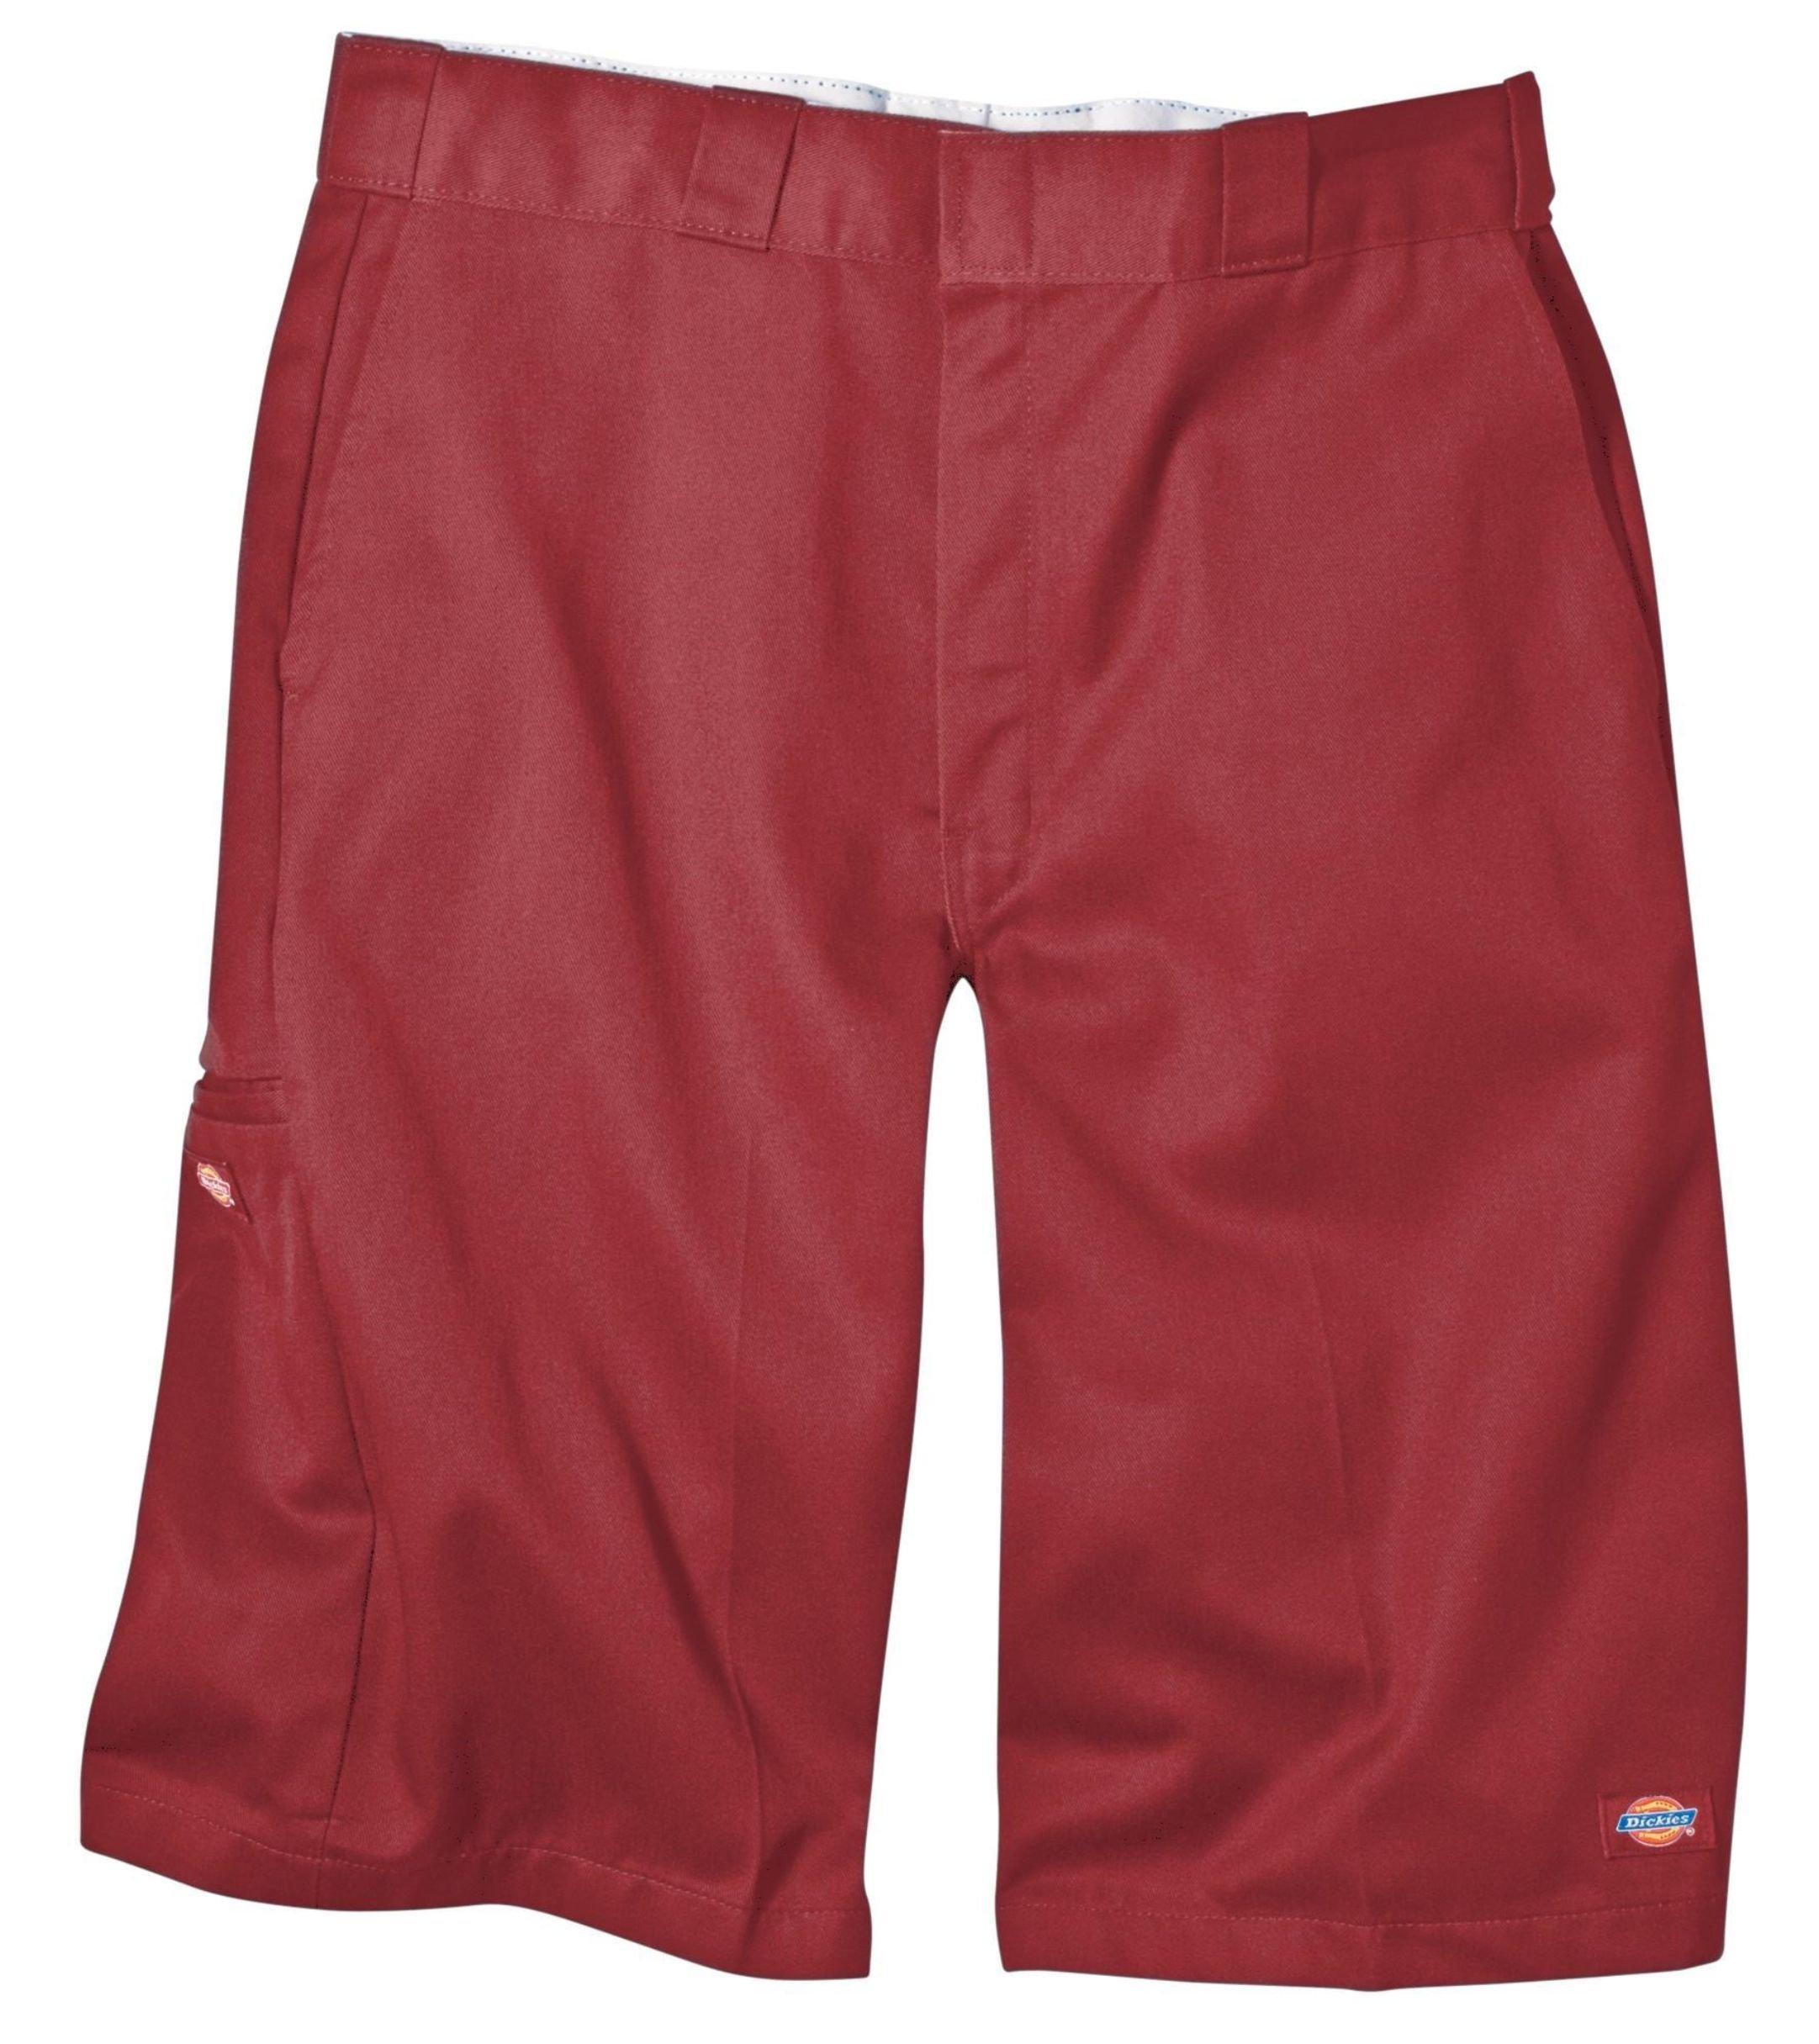 Dickies Men's 13 Inch Loose Fit Multi-Pocket Work Short, English Red 31